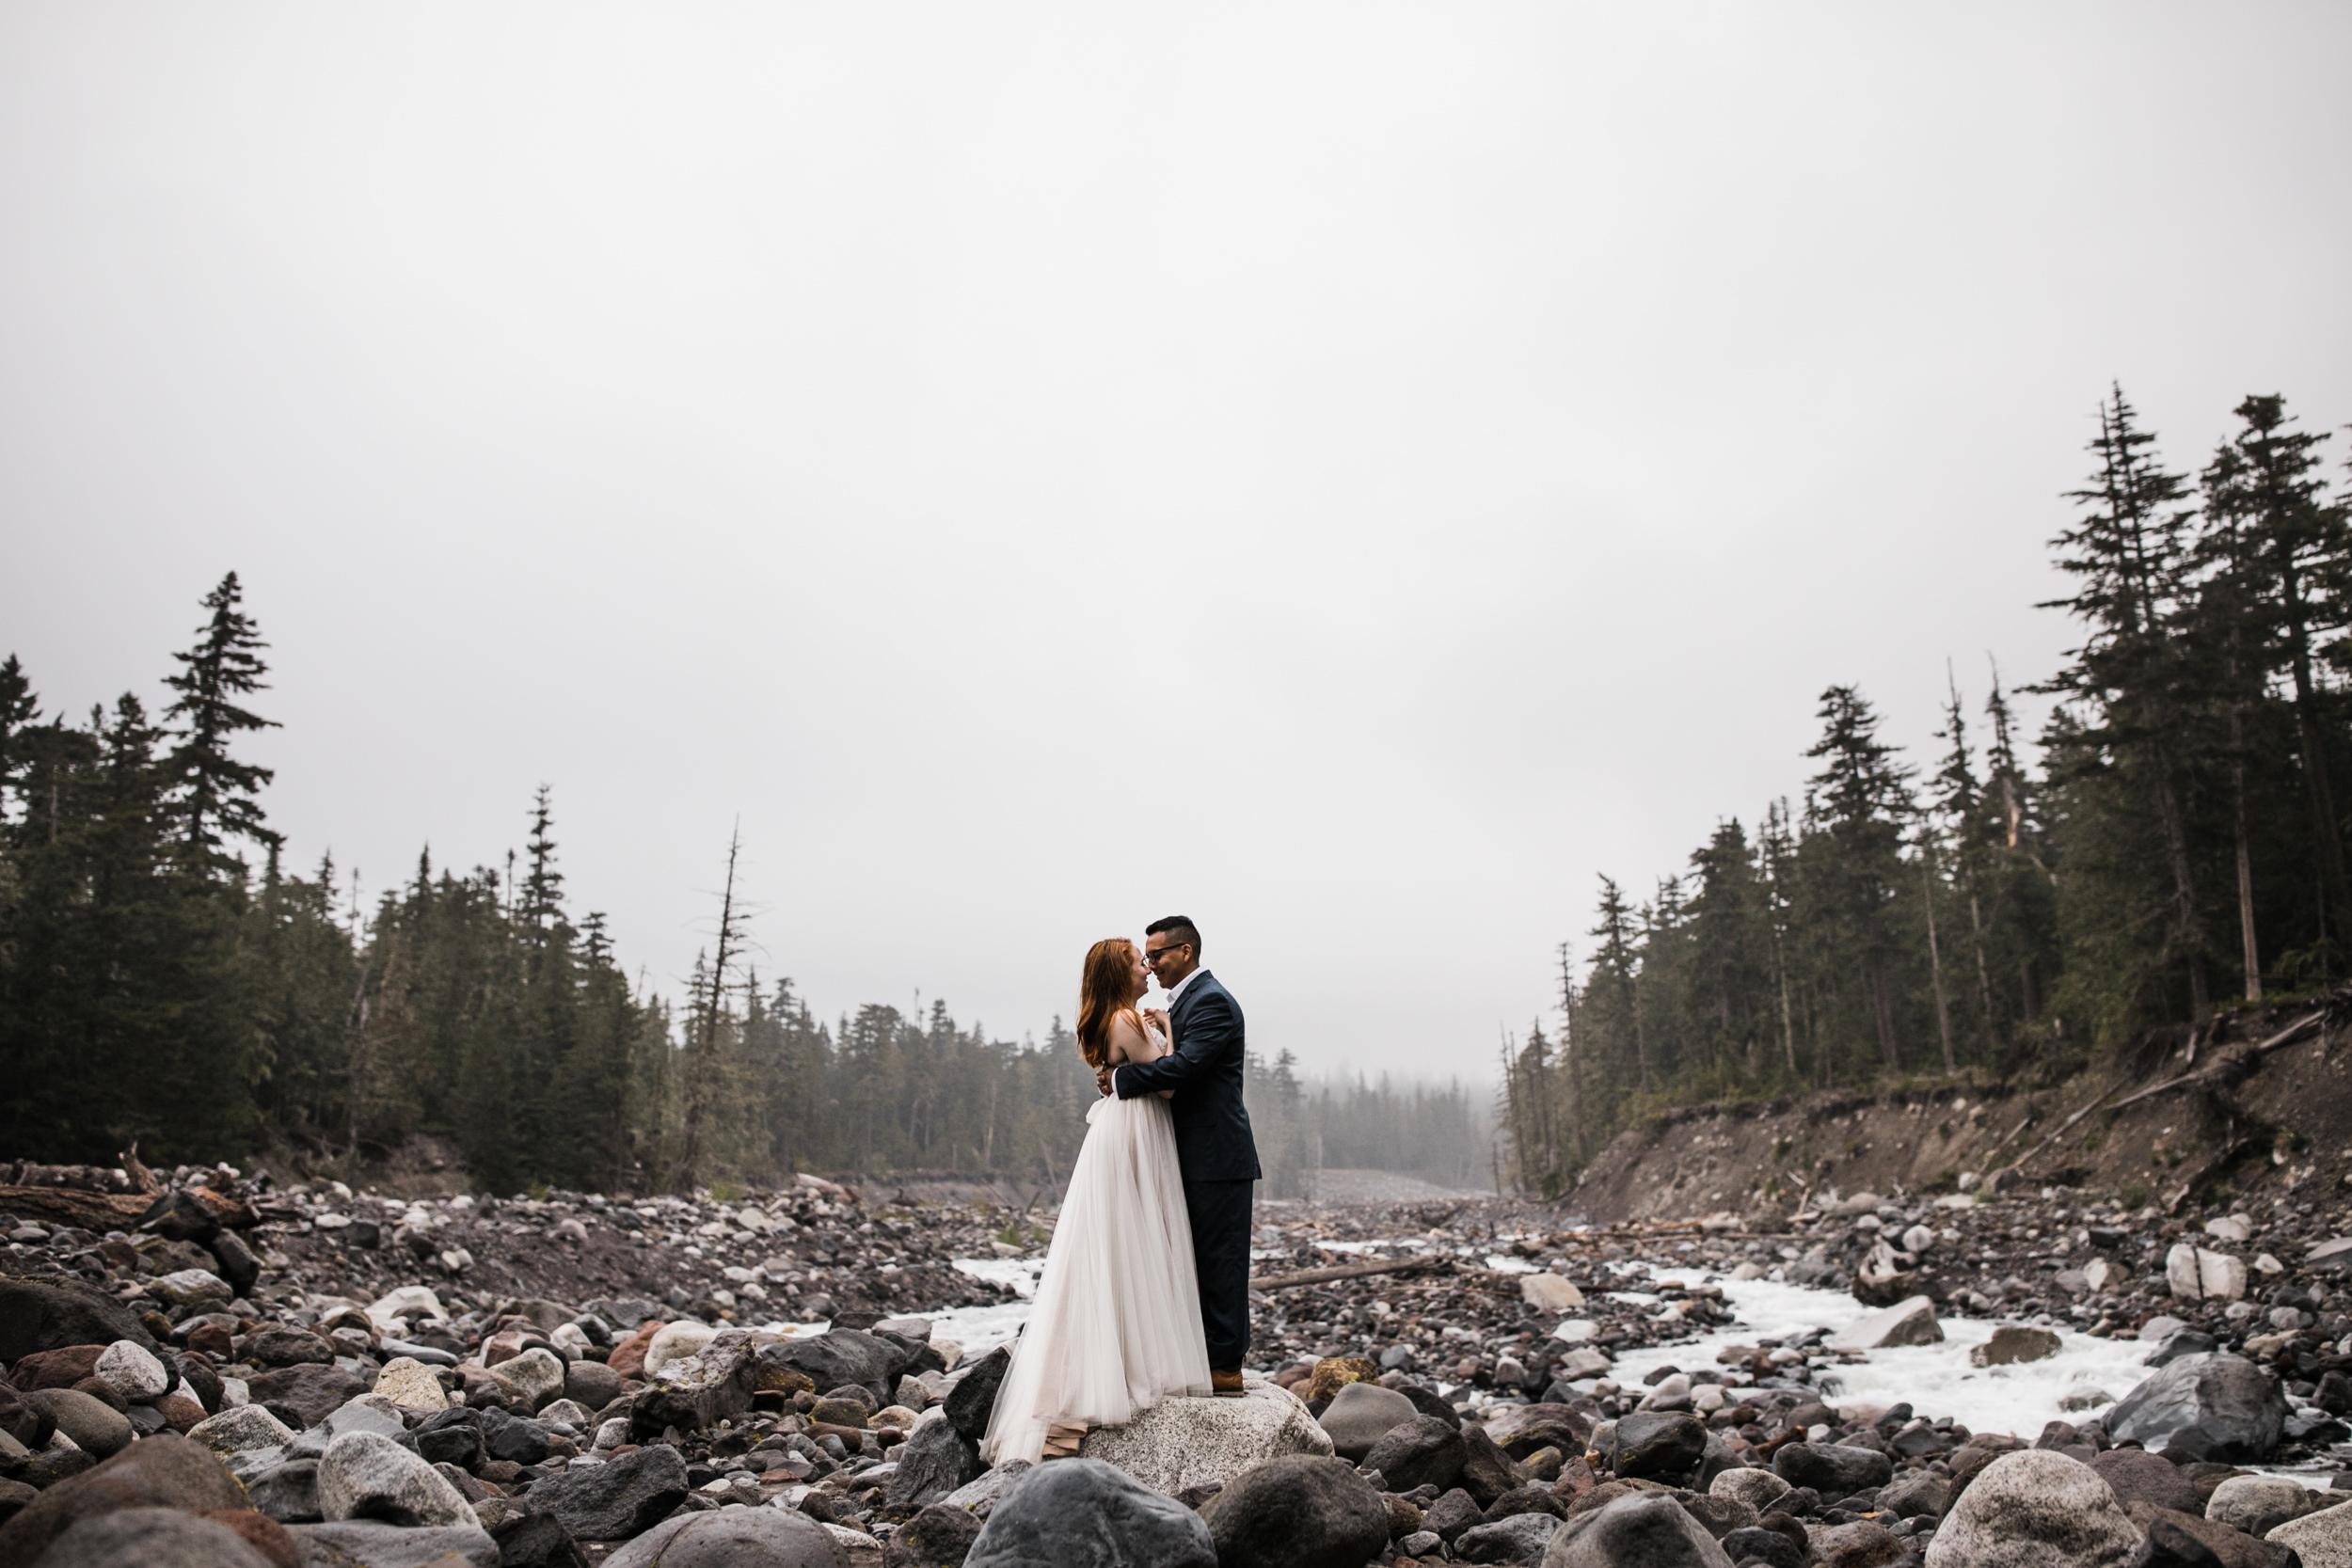 alyssa + horacio's adventurous honeymoon session in mount rainier national park | the hearnes adventure photography | national park elopement inspiration | www.thehearnes.com